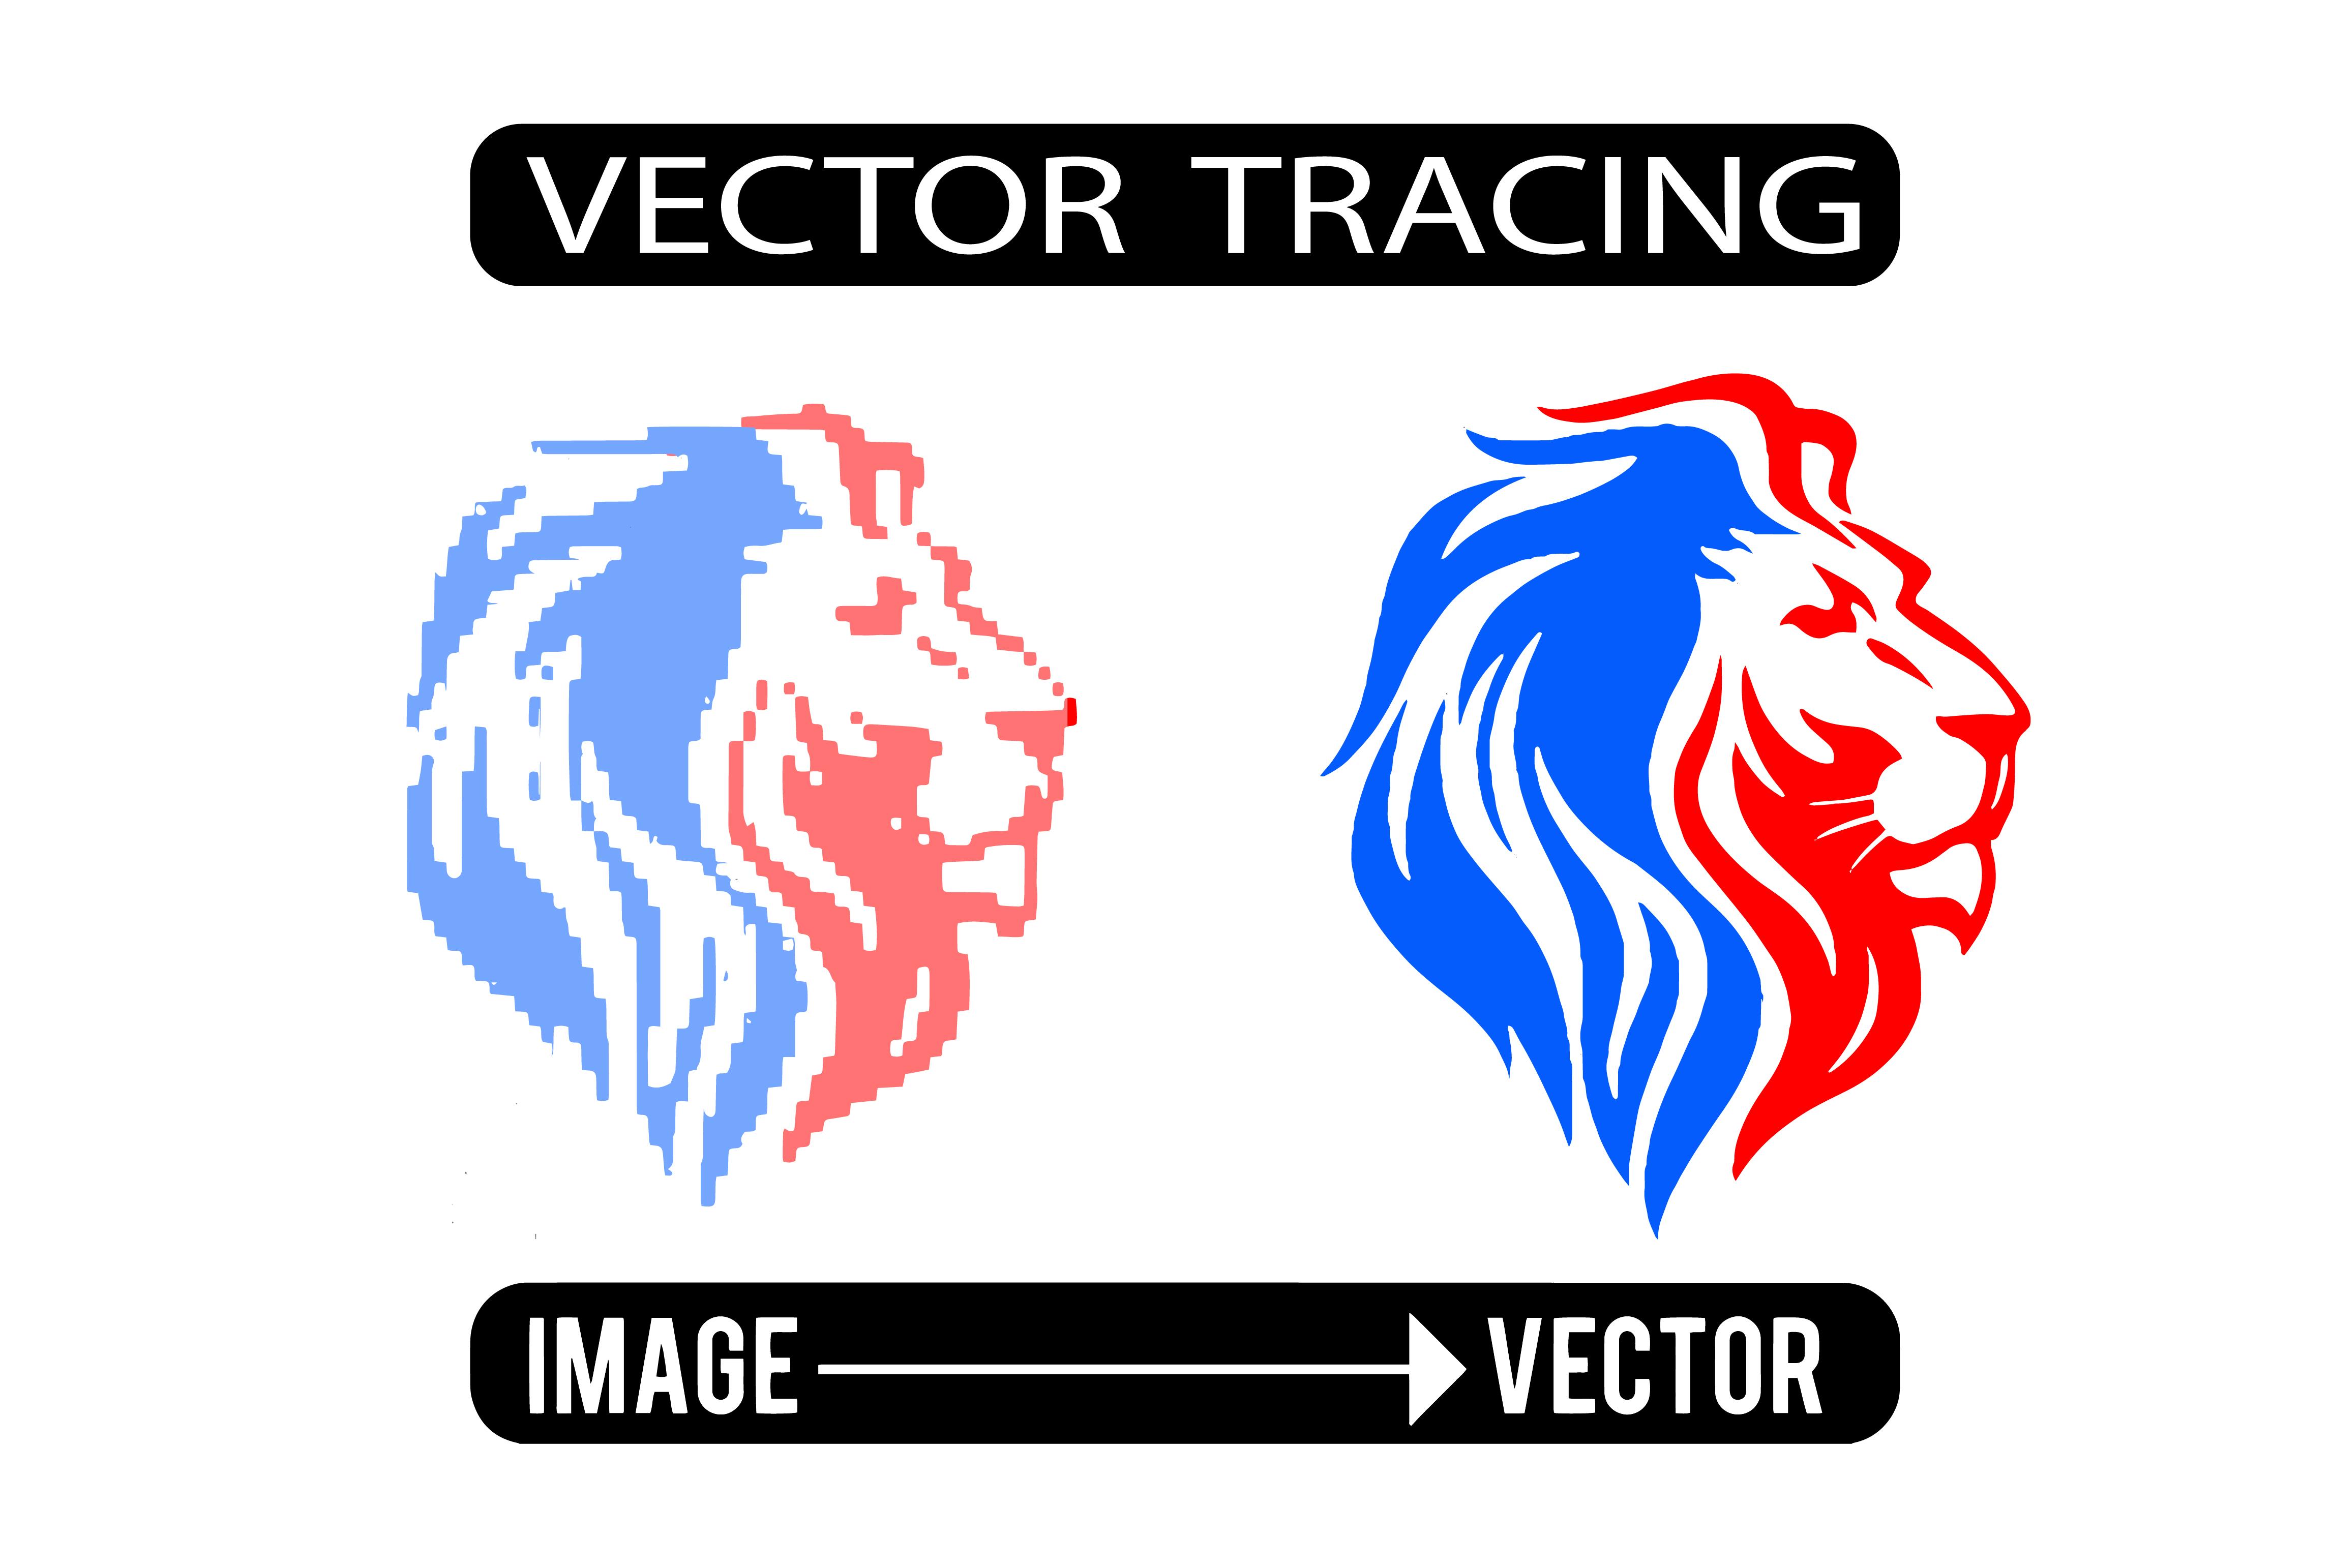 I will redraw vector tracing vectorize convert logo to vector